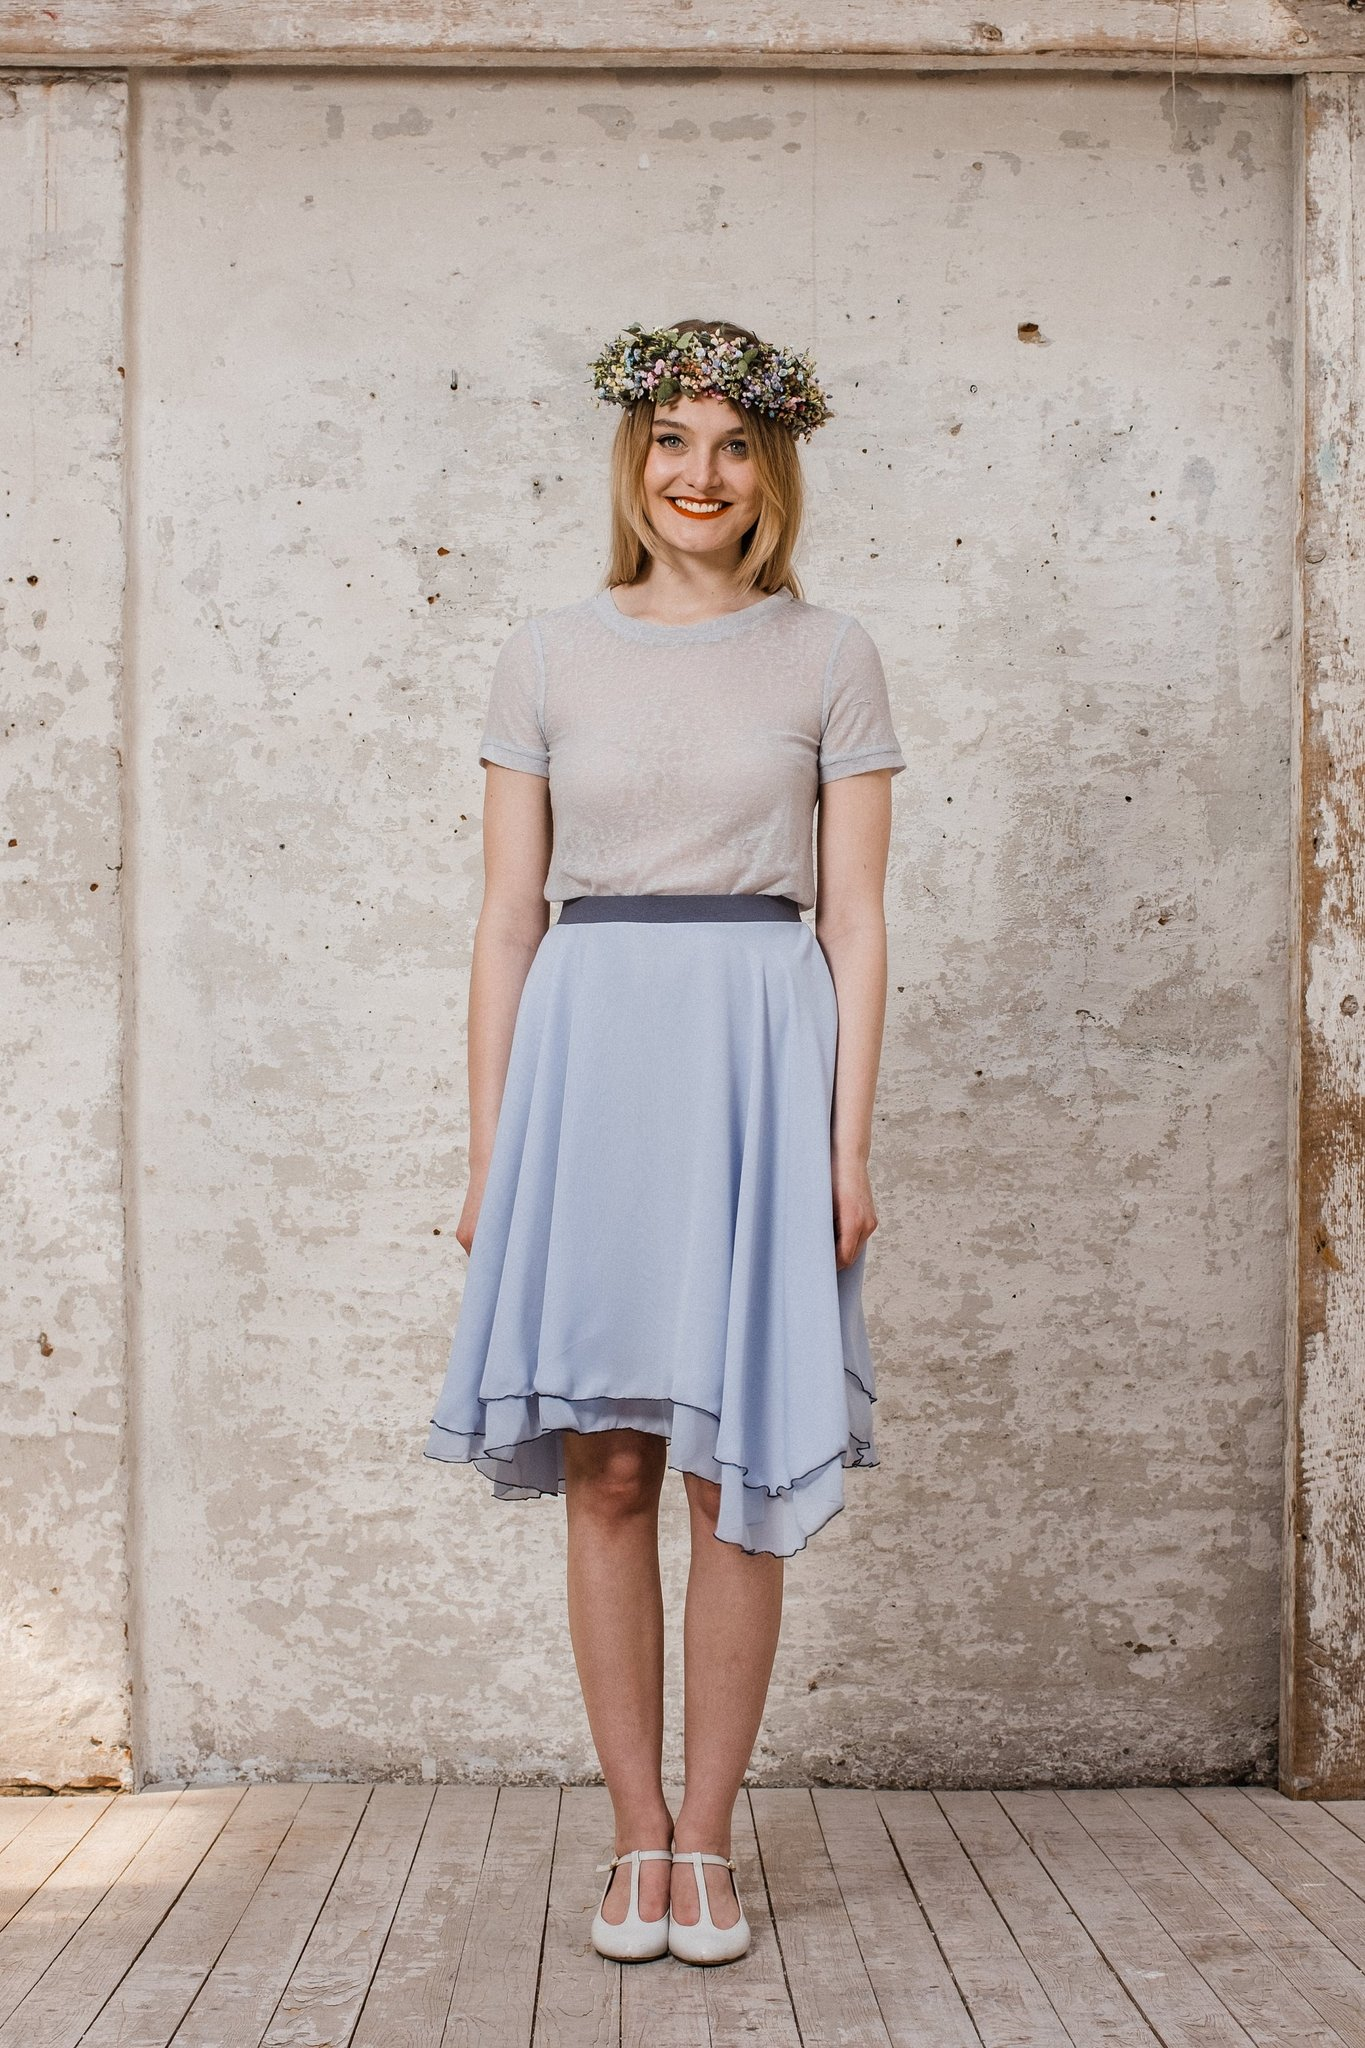 Kleid Trauzeugin Hochzeit, Kleid kurz